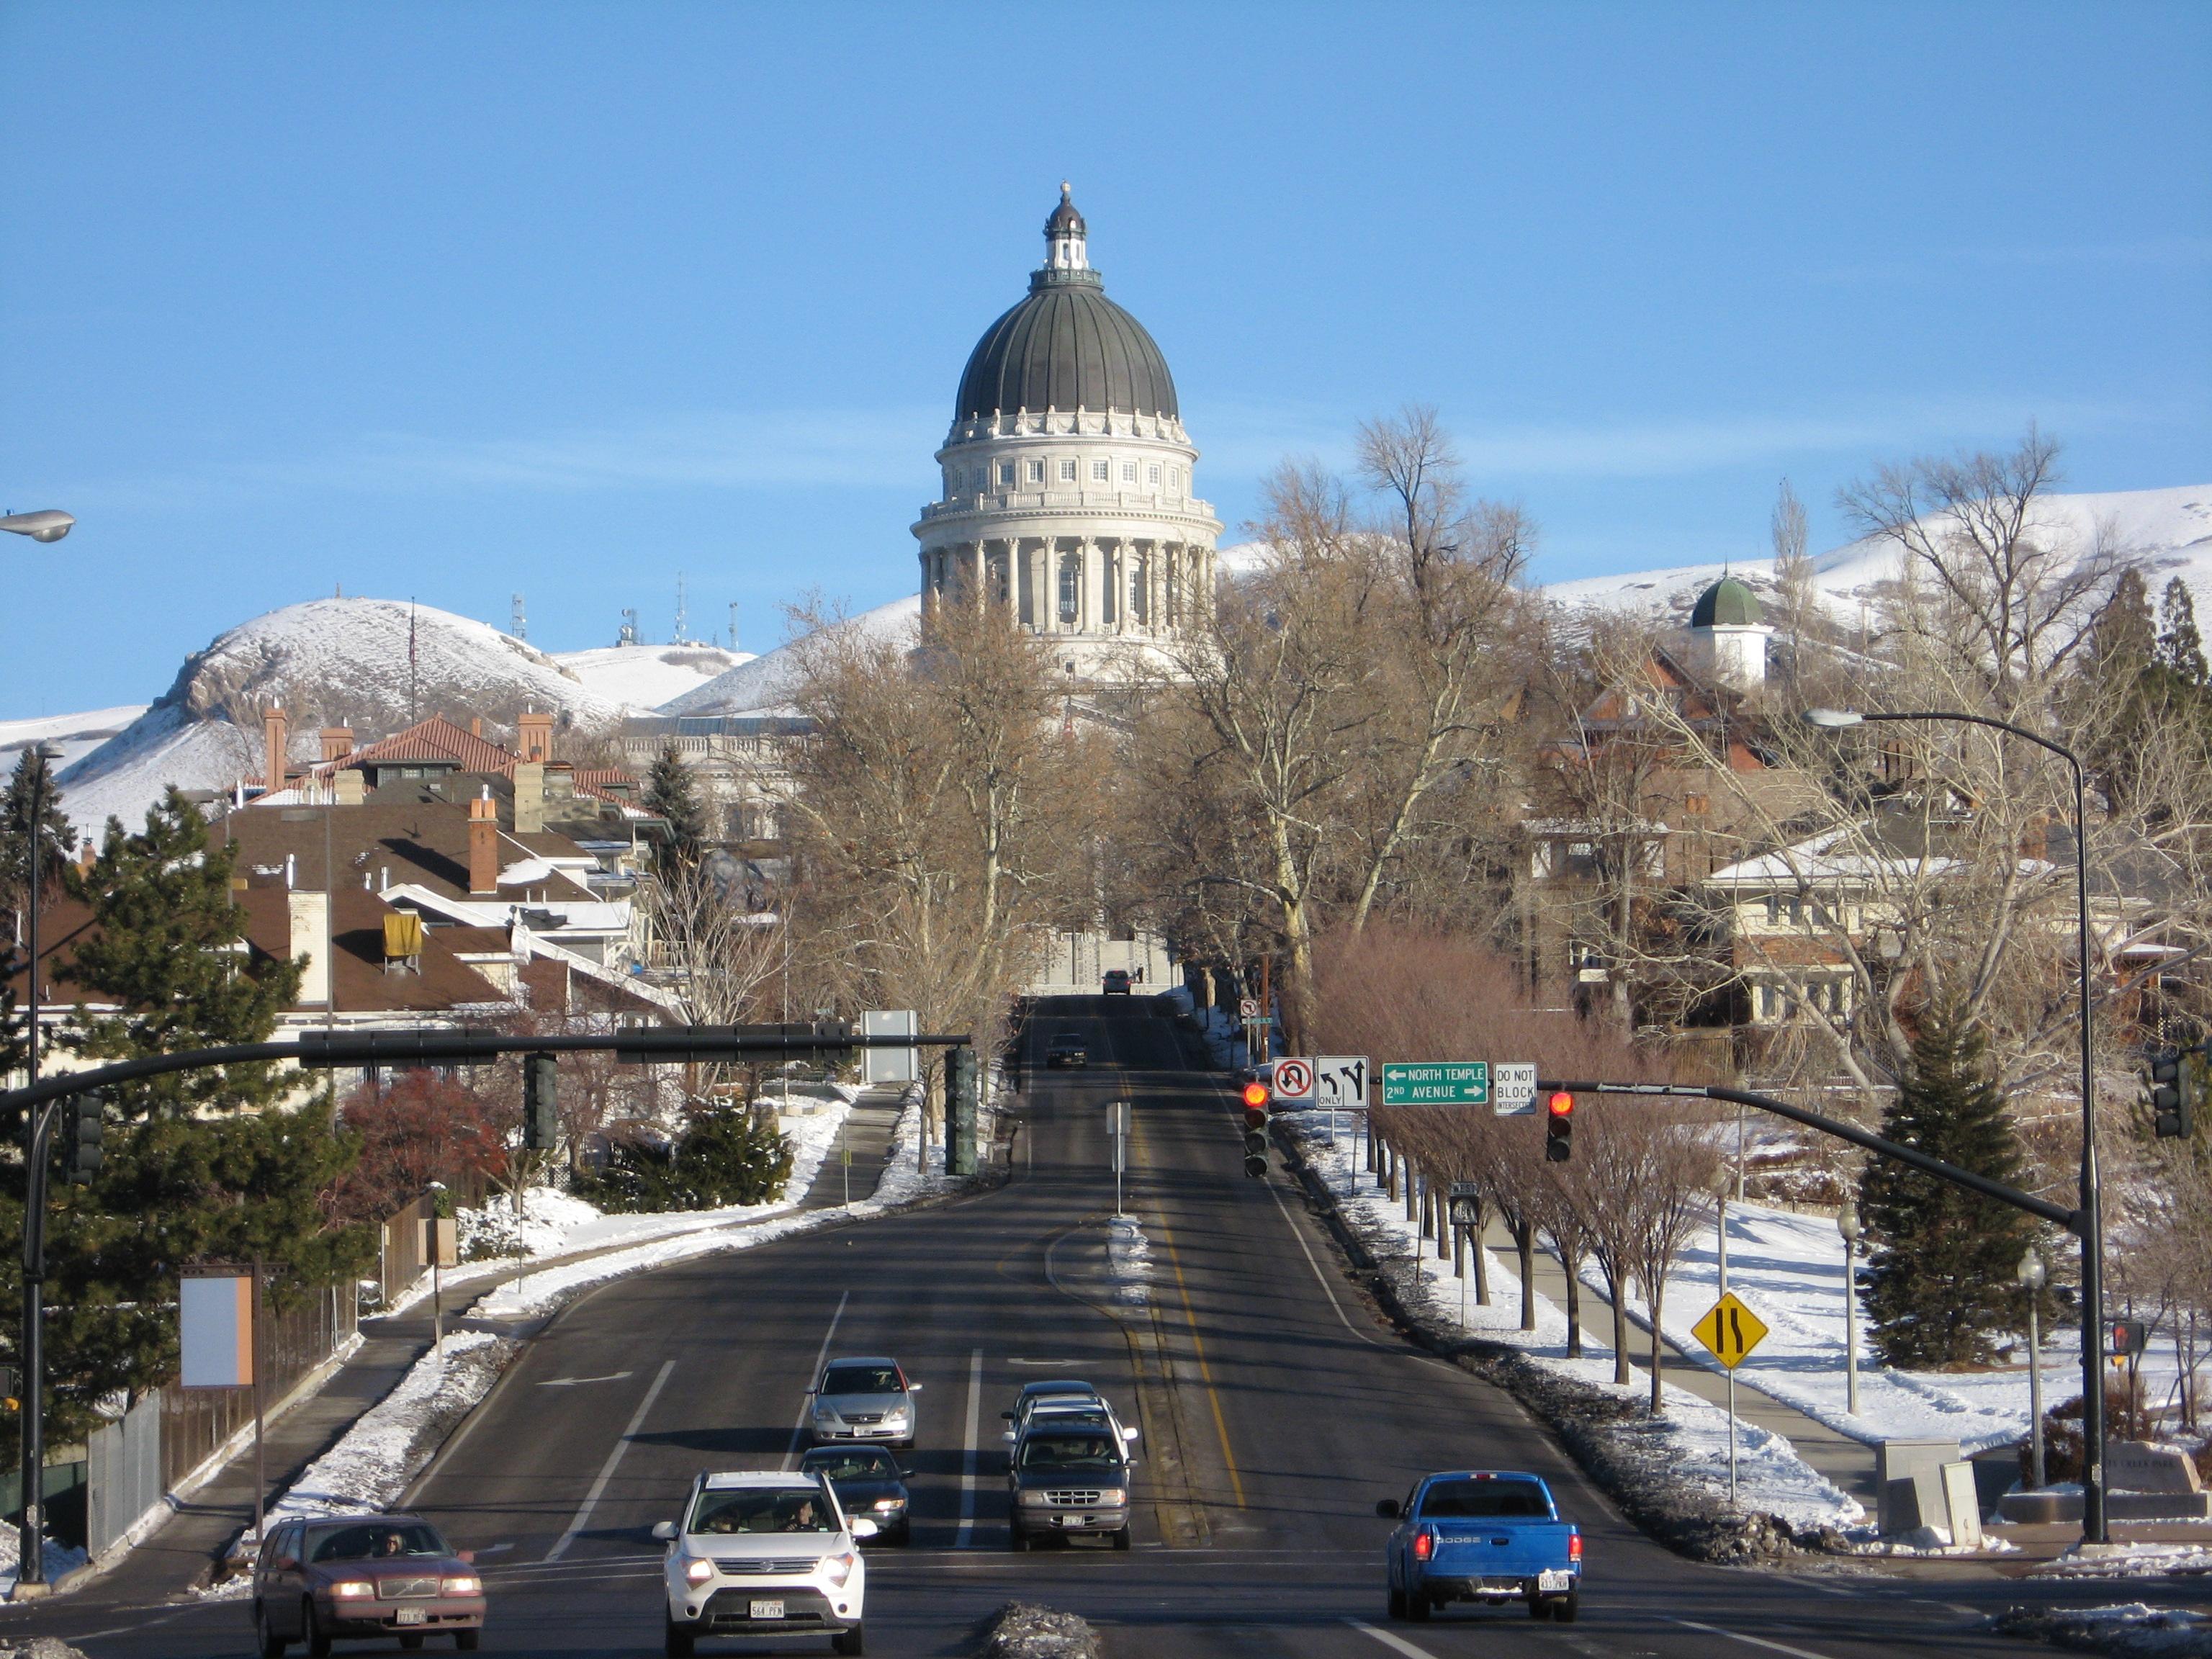 utah state capitol seen from state street.jpg